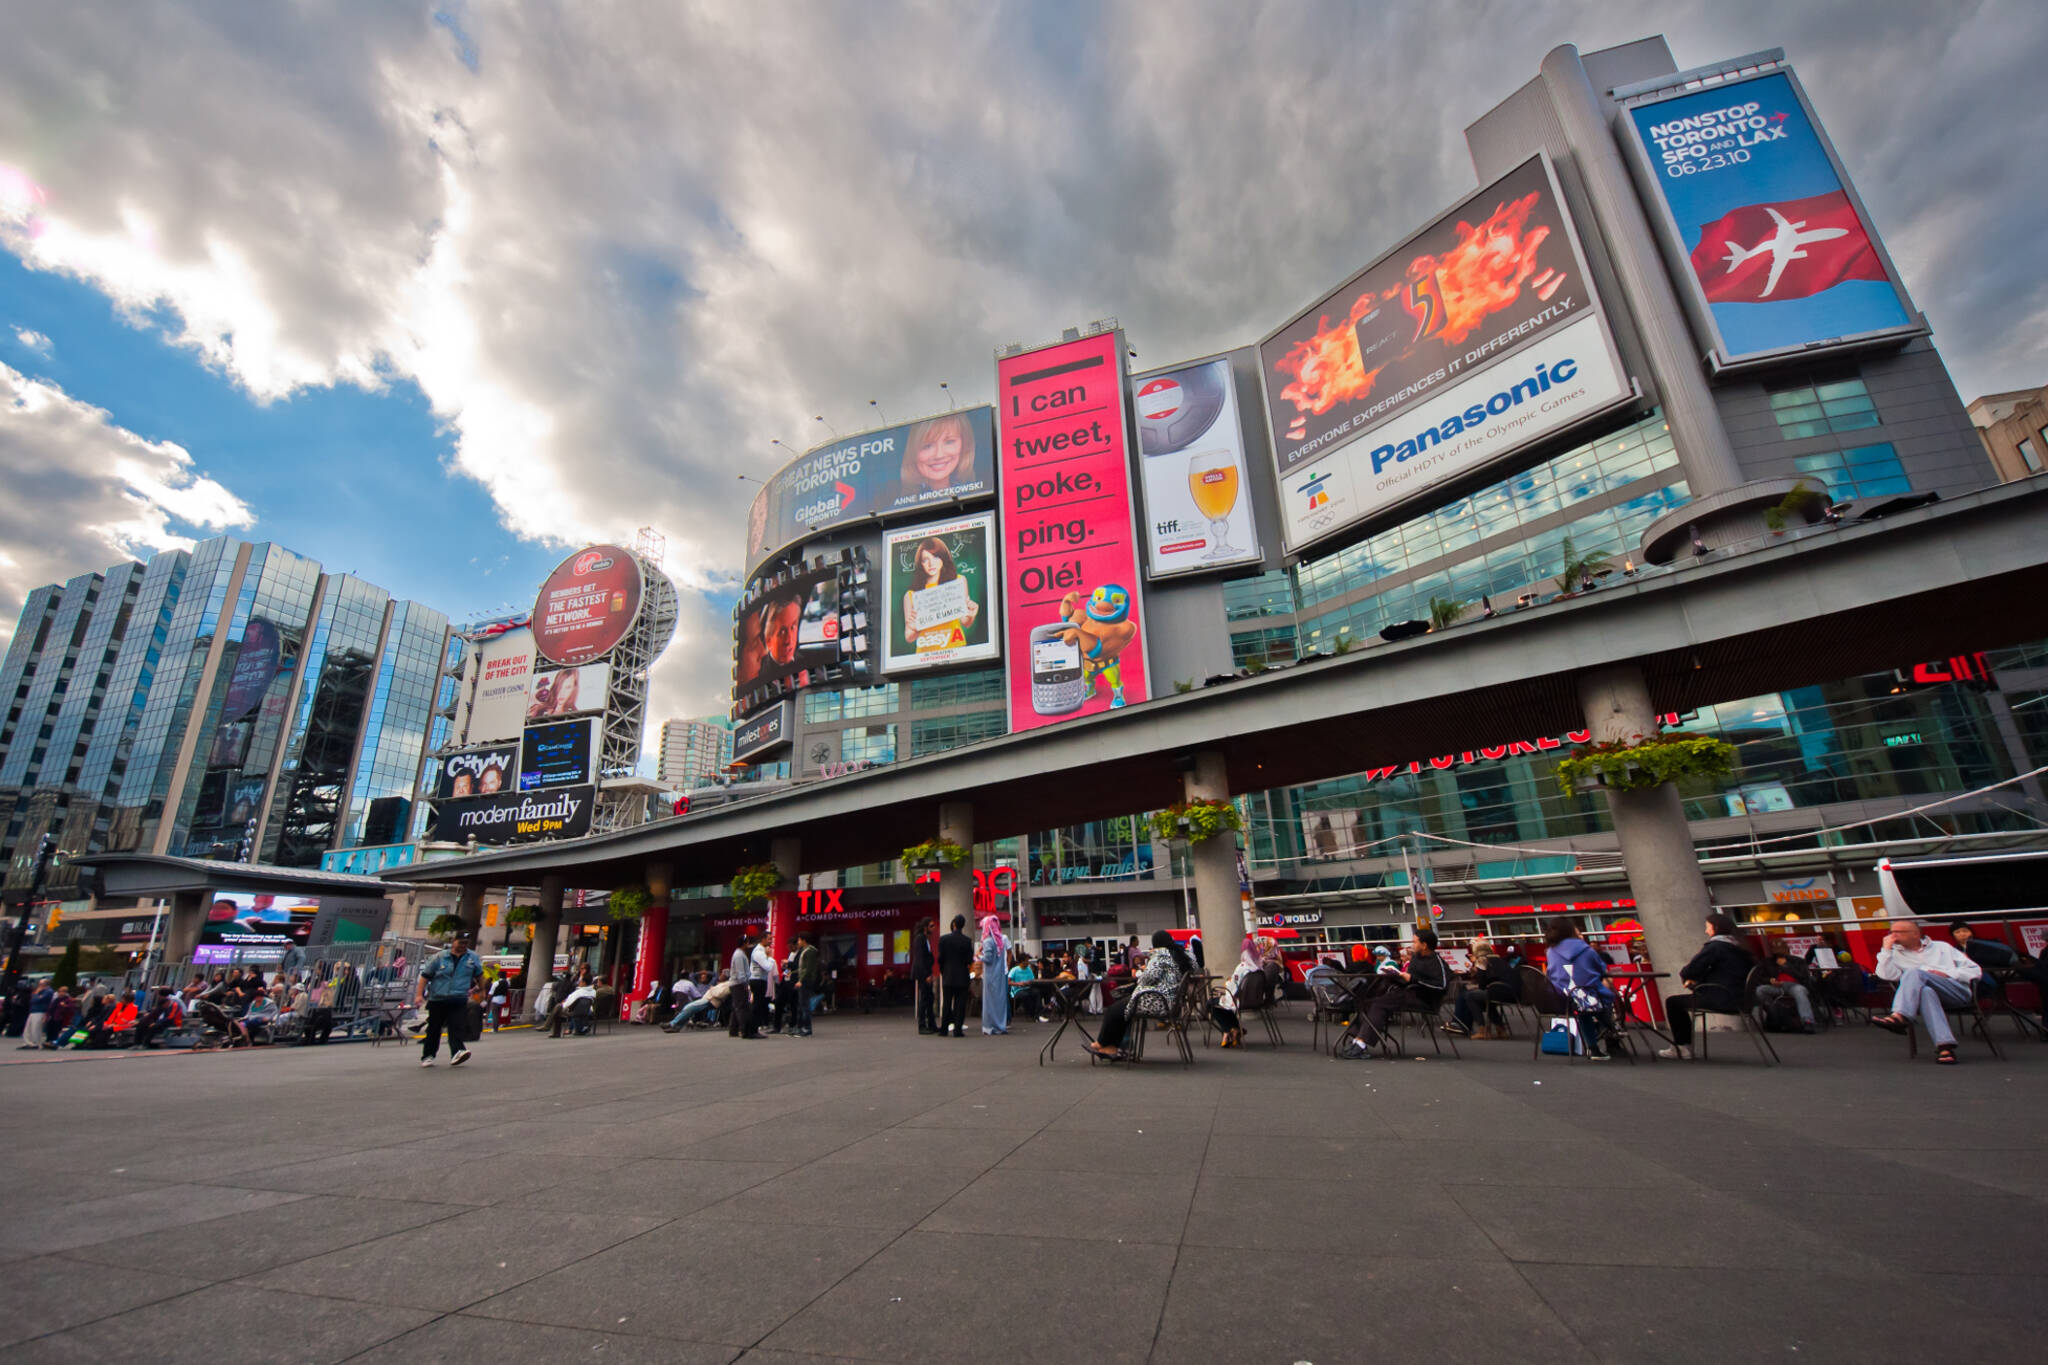 Big changes coming to Yonge-Dundas Square